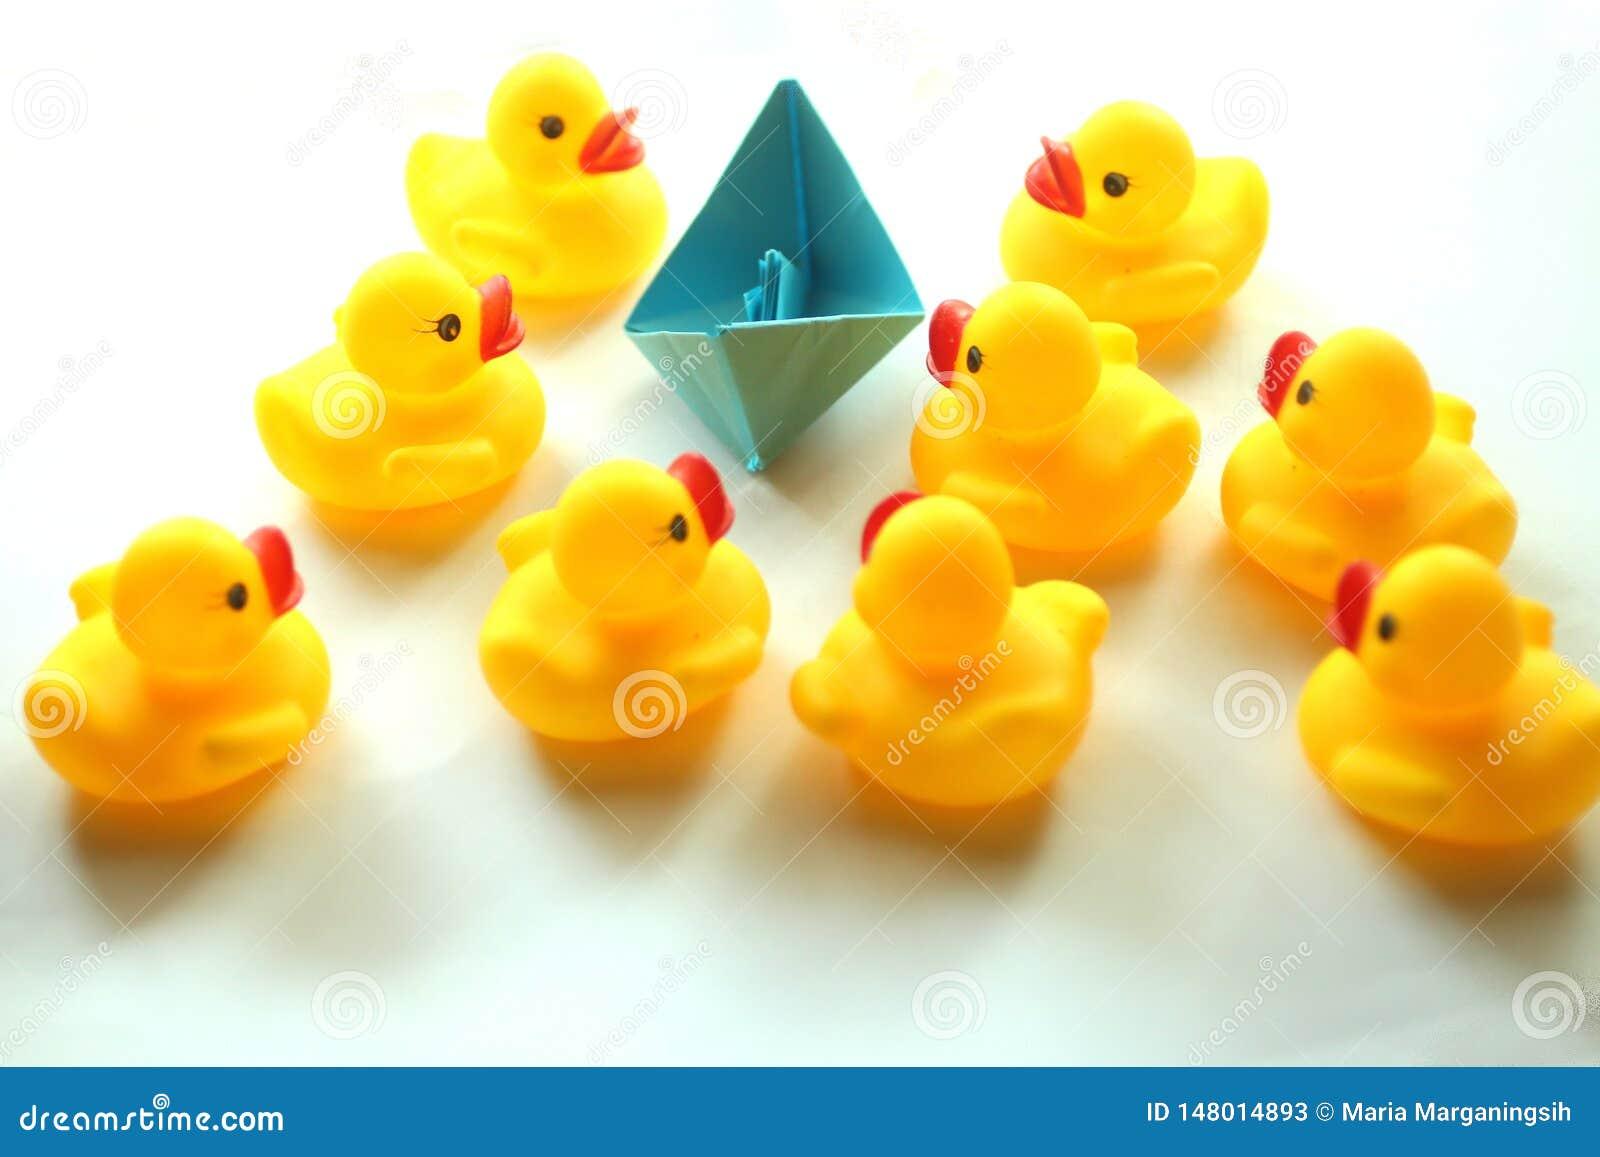 Leuke gele rubbereenden en één document origamiboot in blauwe kleur